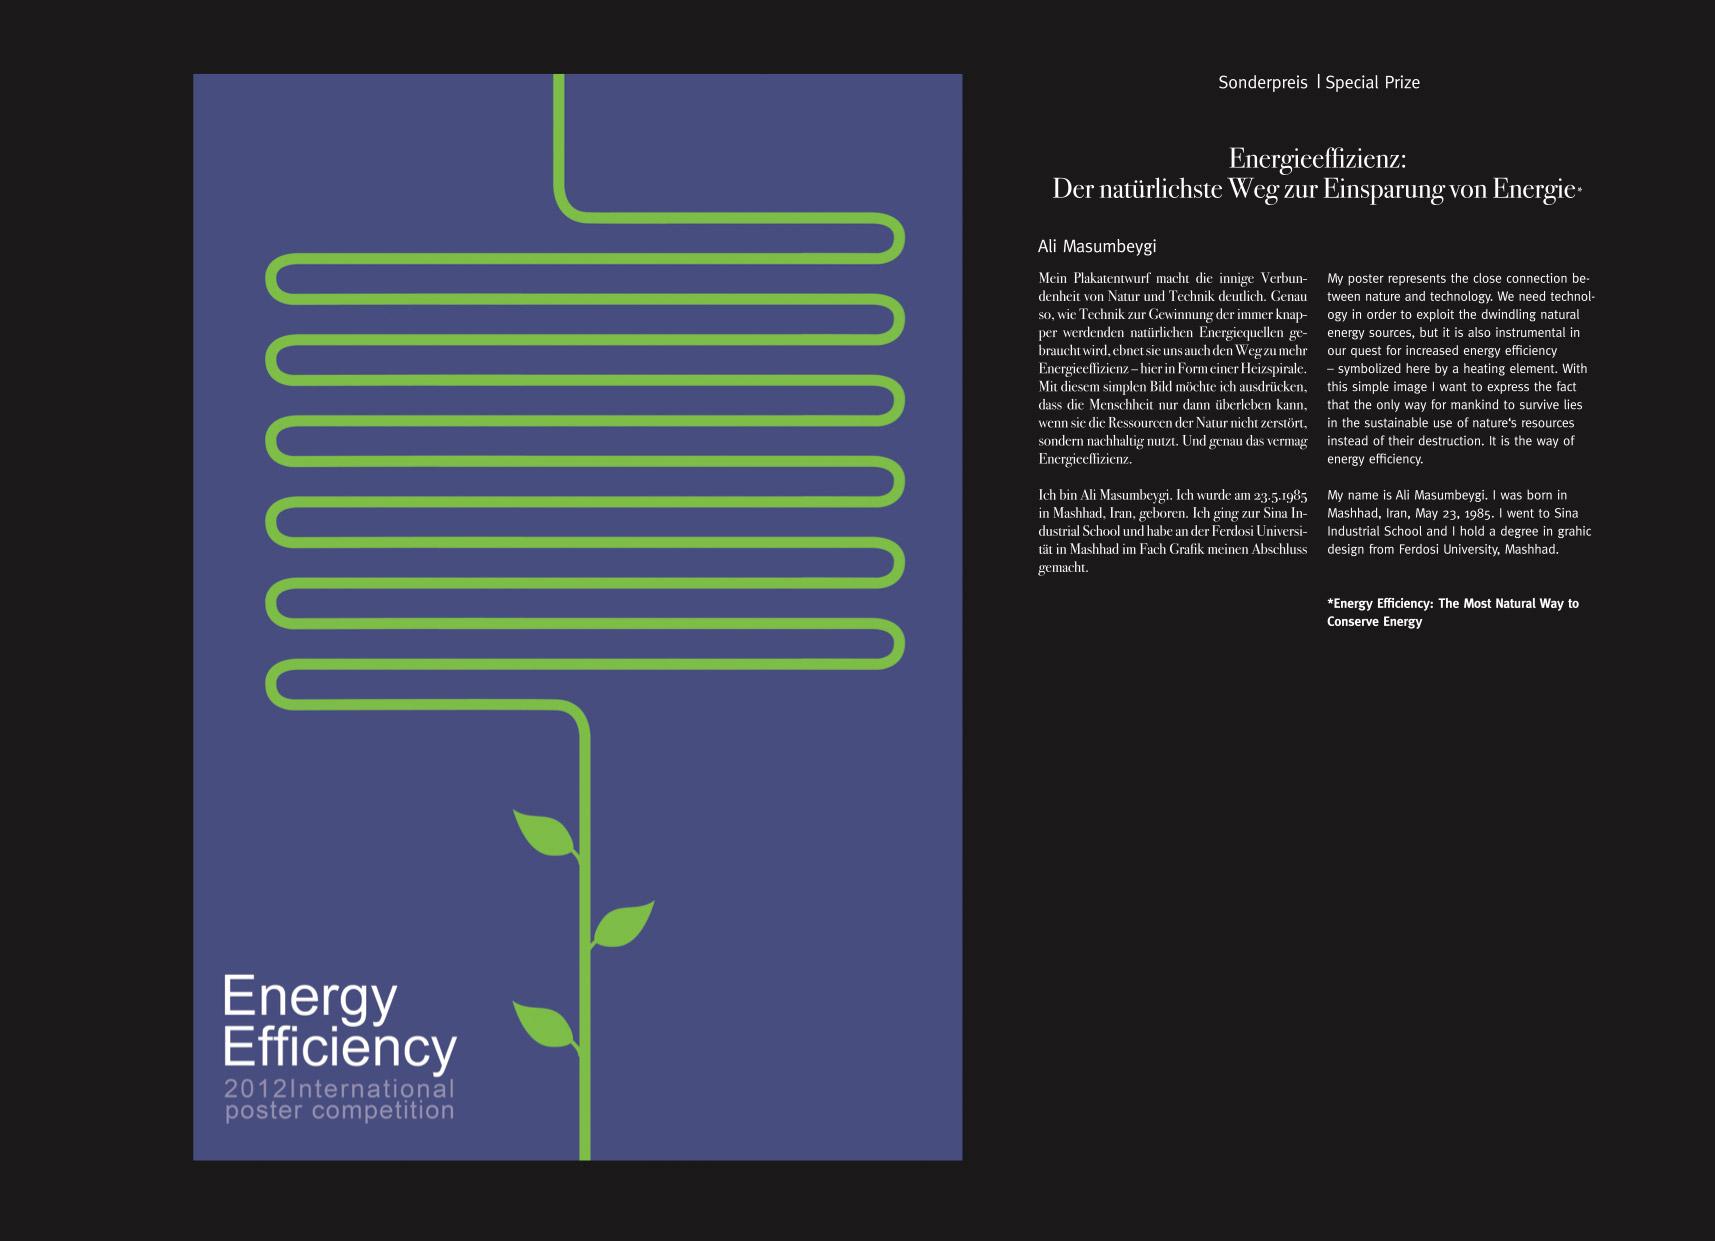 Energie-Effizienz_05